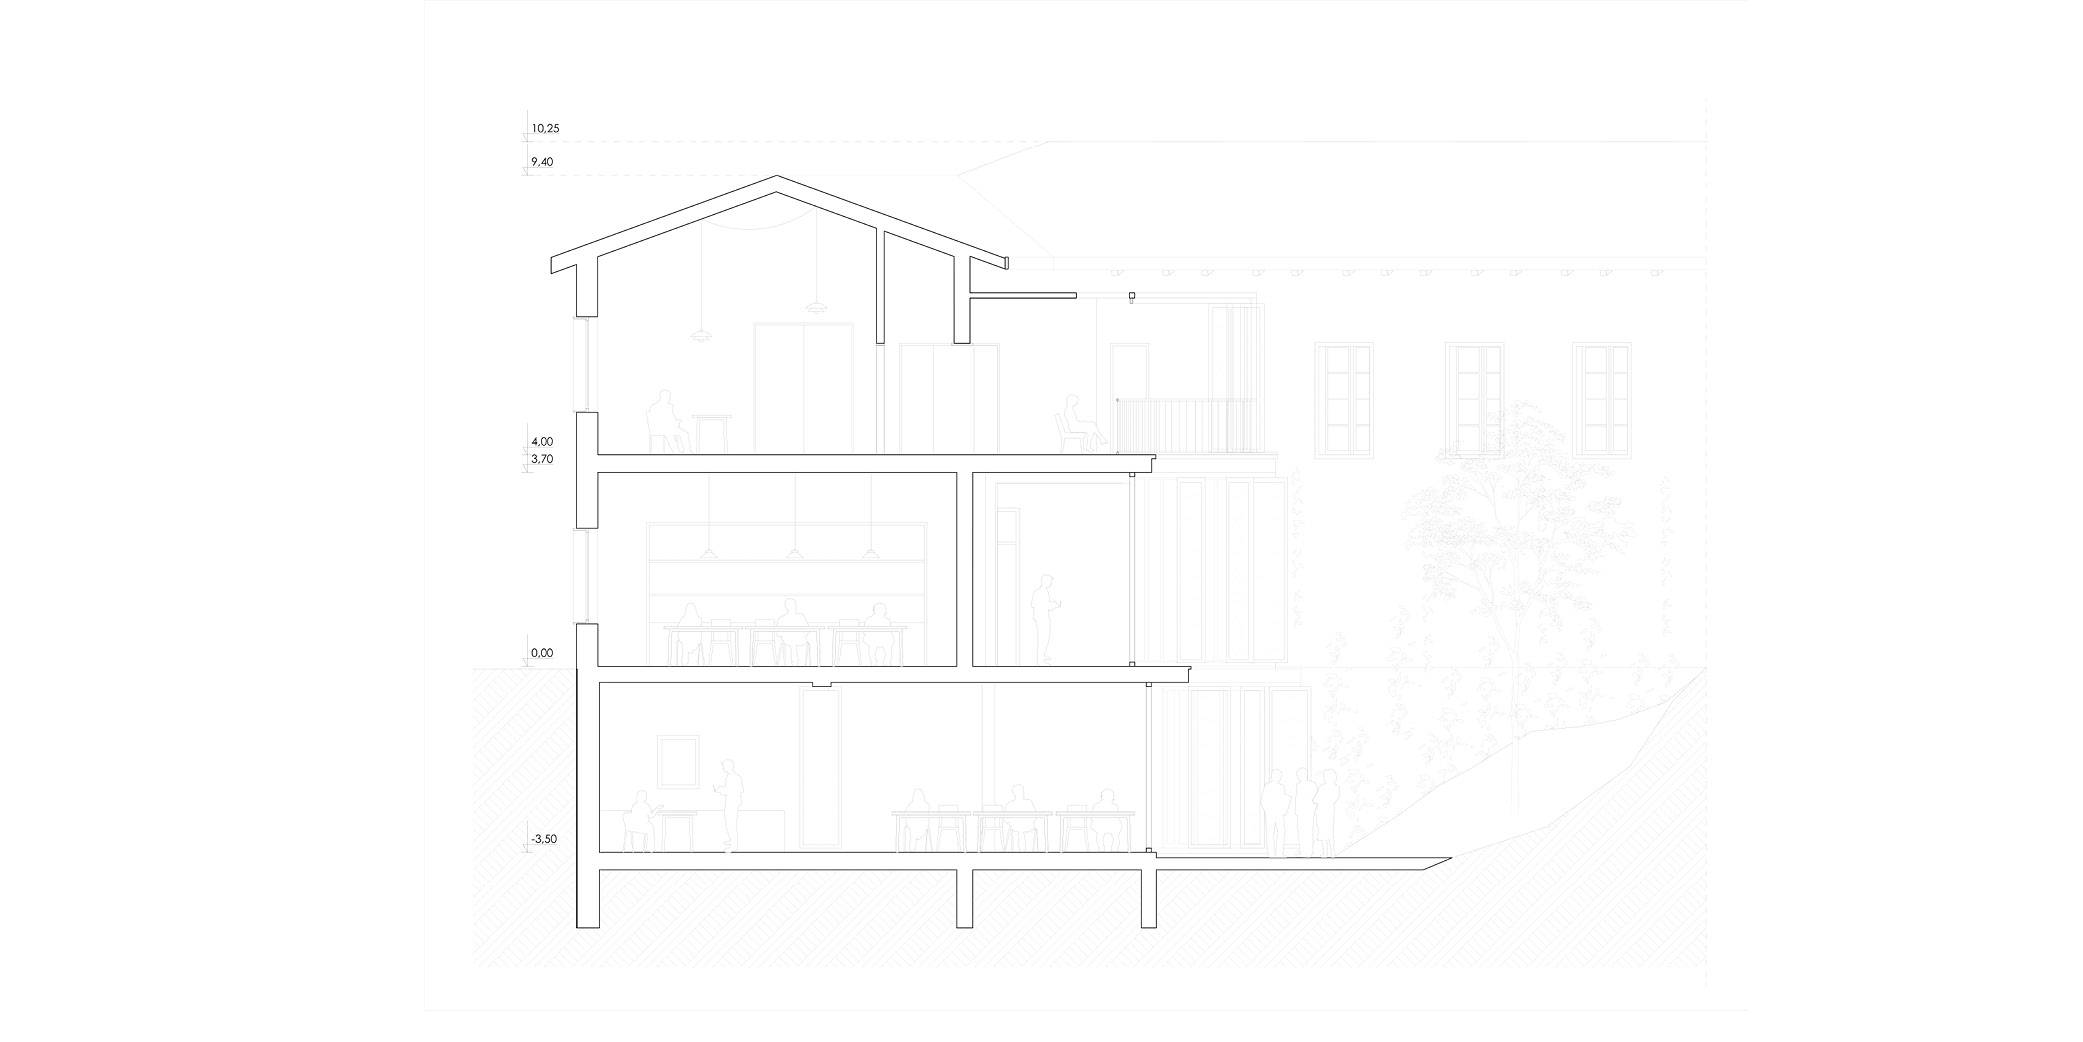 Daganzo City Hall Extention Architecture Arquitectura OCA ARCHITECTS OCA arquitectas Hernan Lleida Bernardo Garcia_10